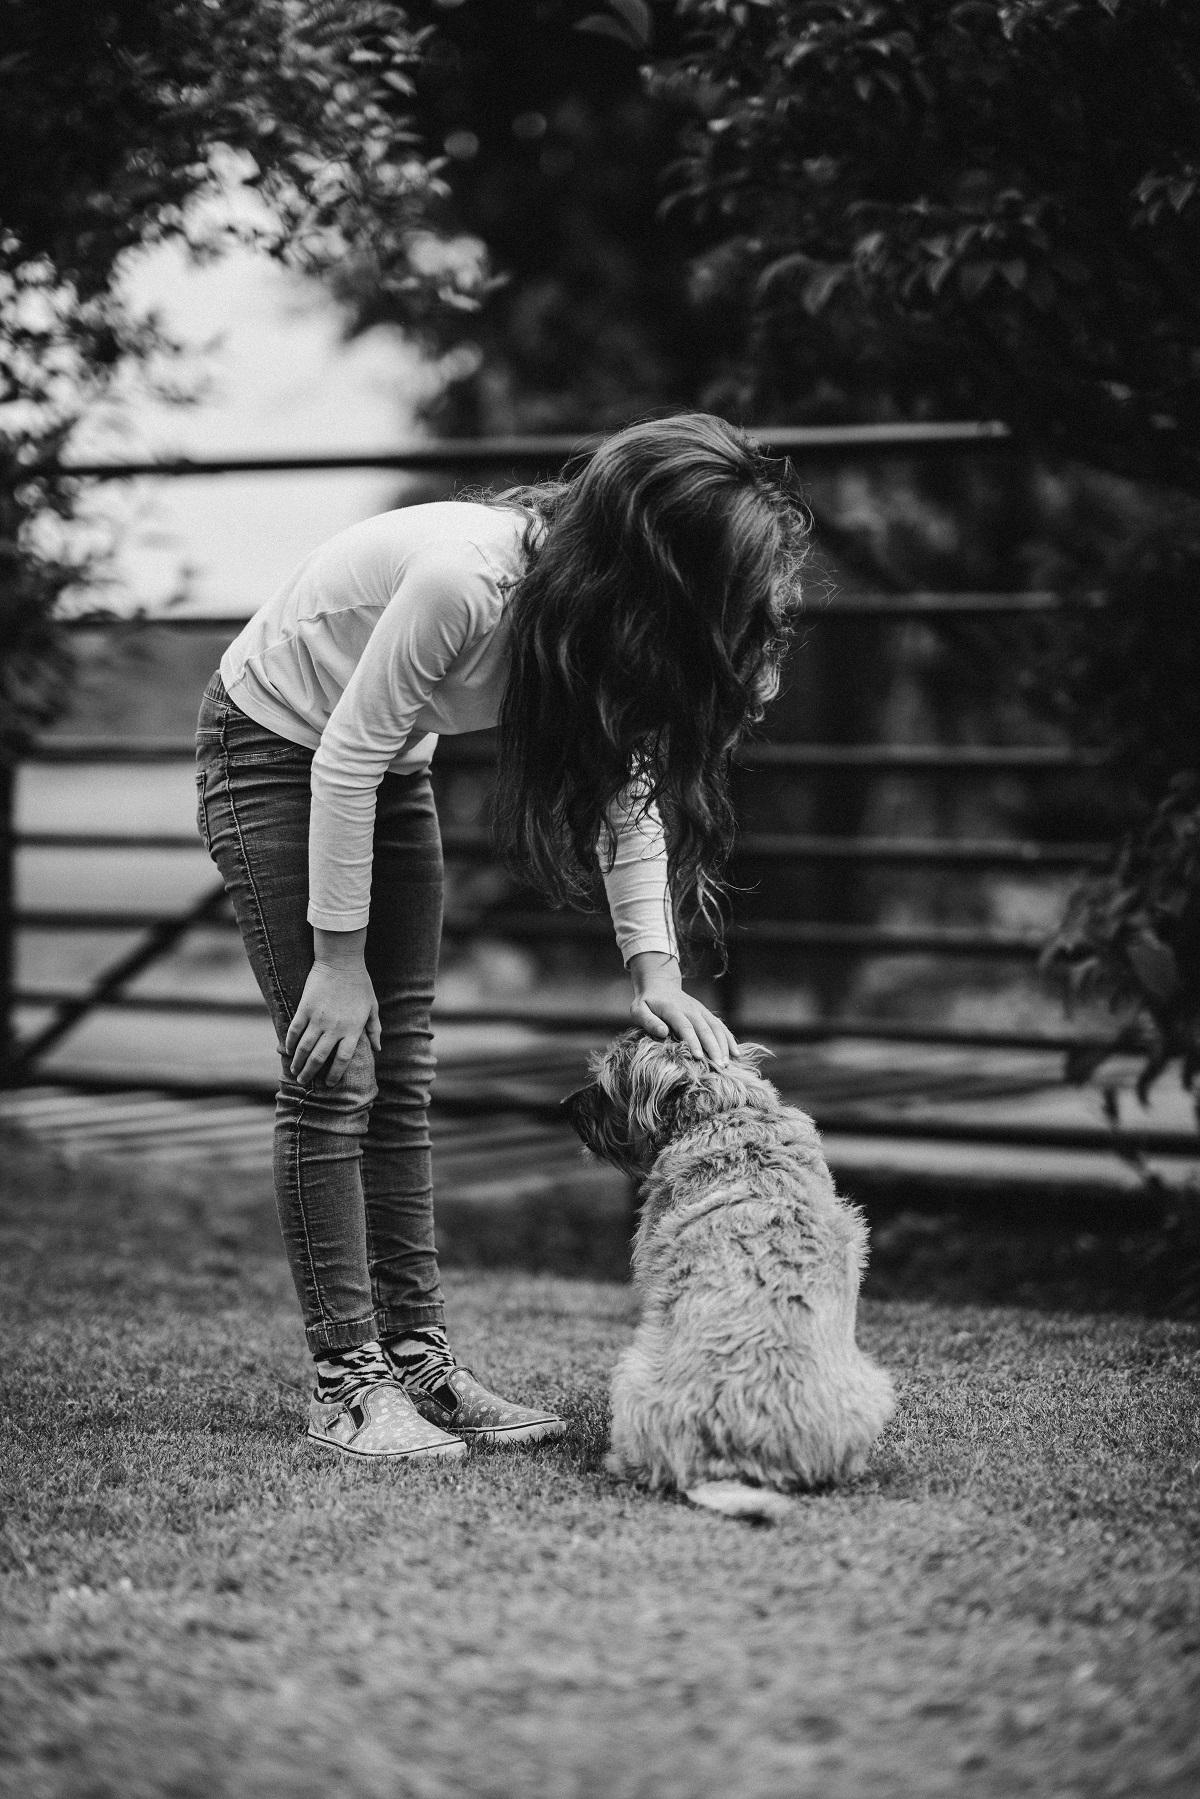 Autistic Girl with dog